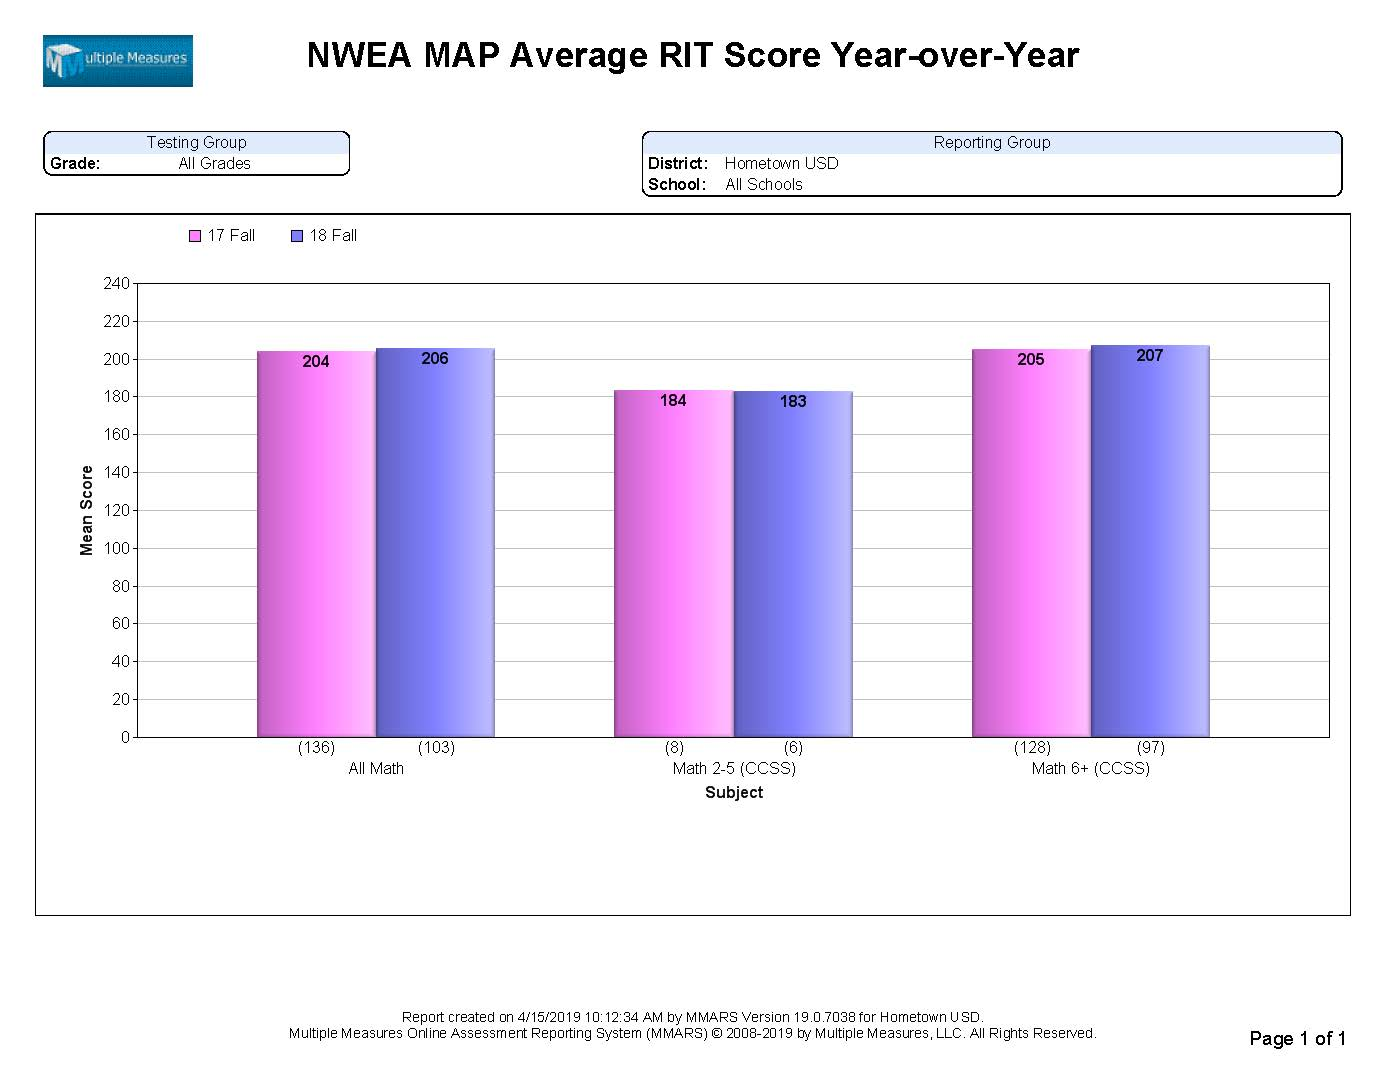 NWEA-Summary_AvgRIT_YoY_CATALOG.jpg